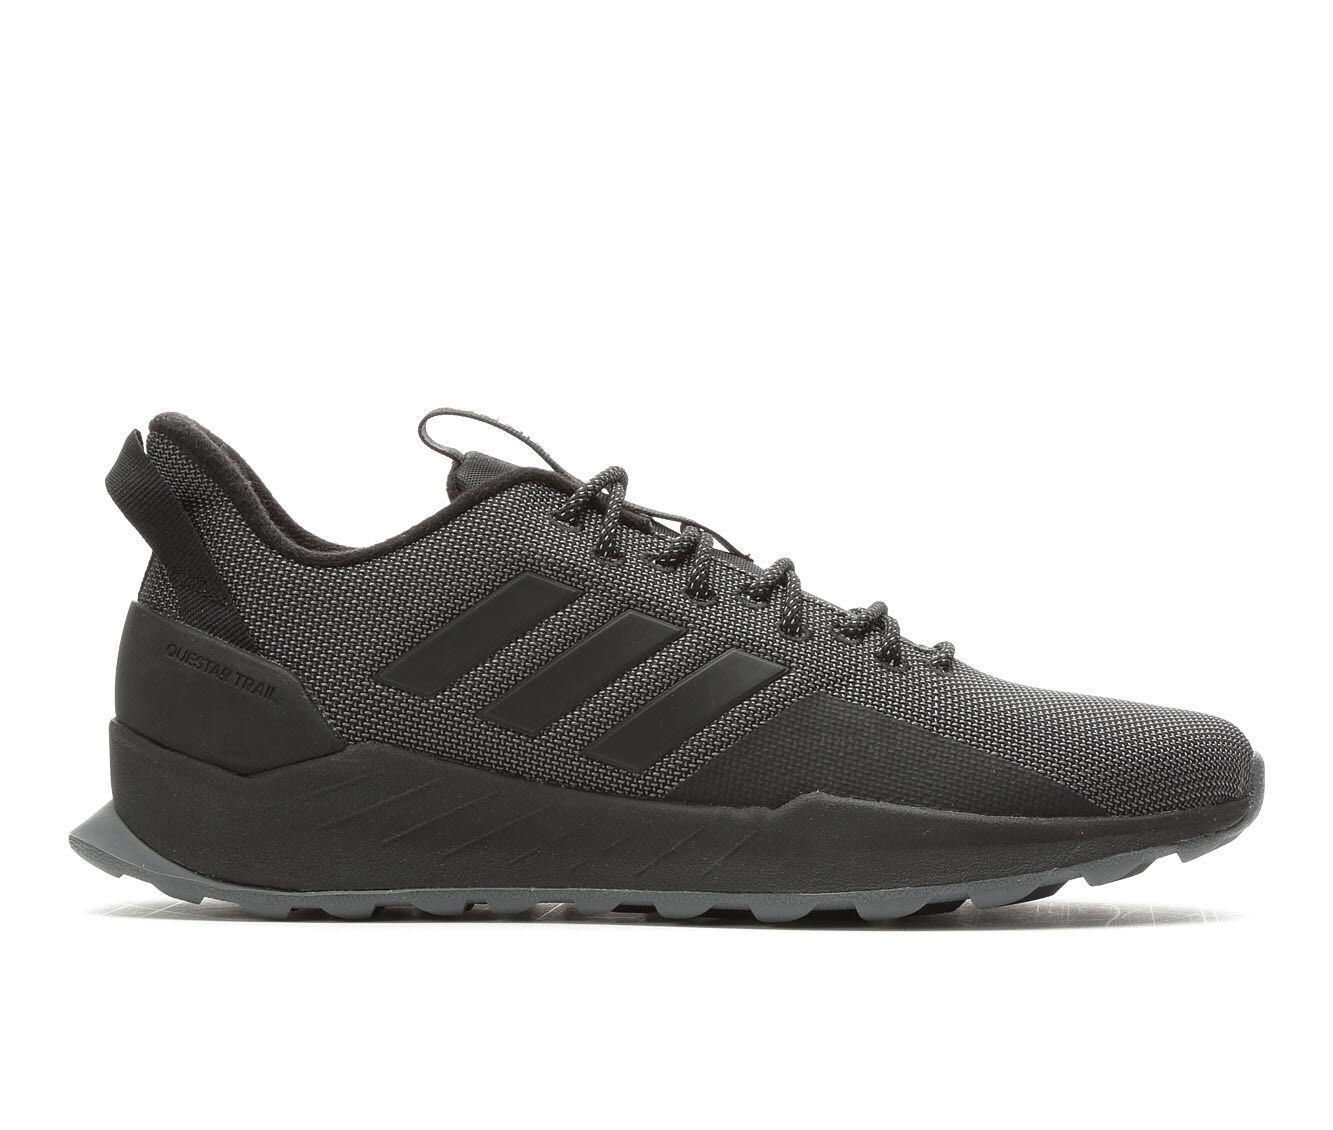 Big Discount Men's Adidas Questar Trail Running Shoes Black/Grey